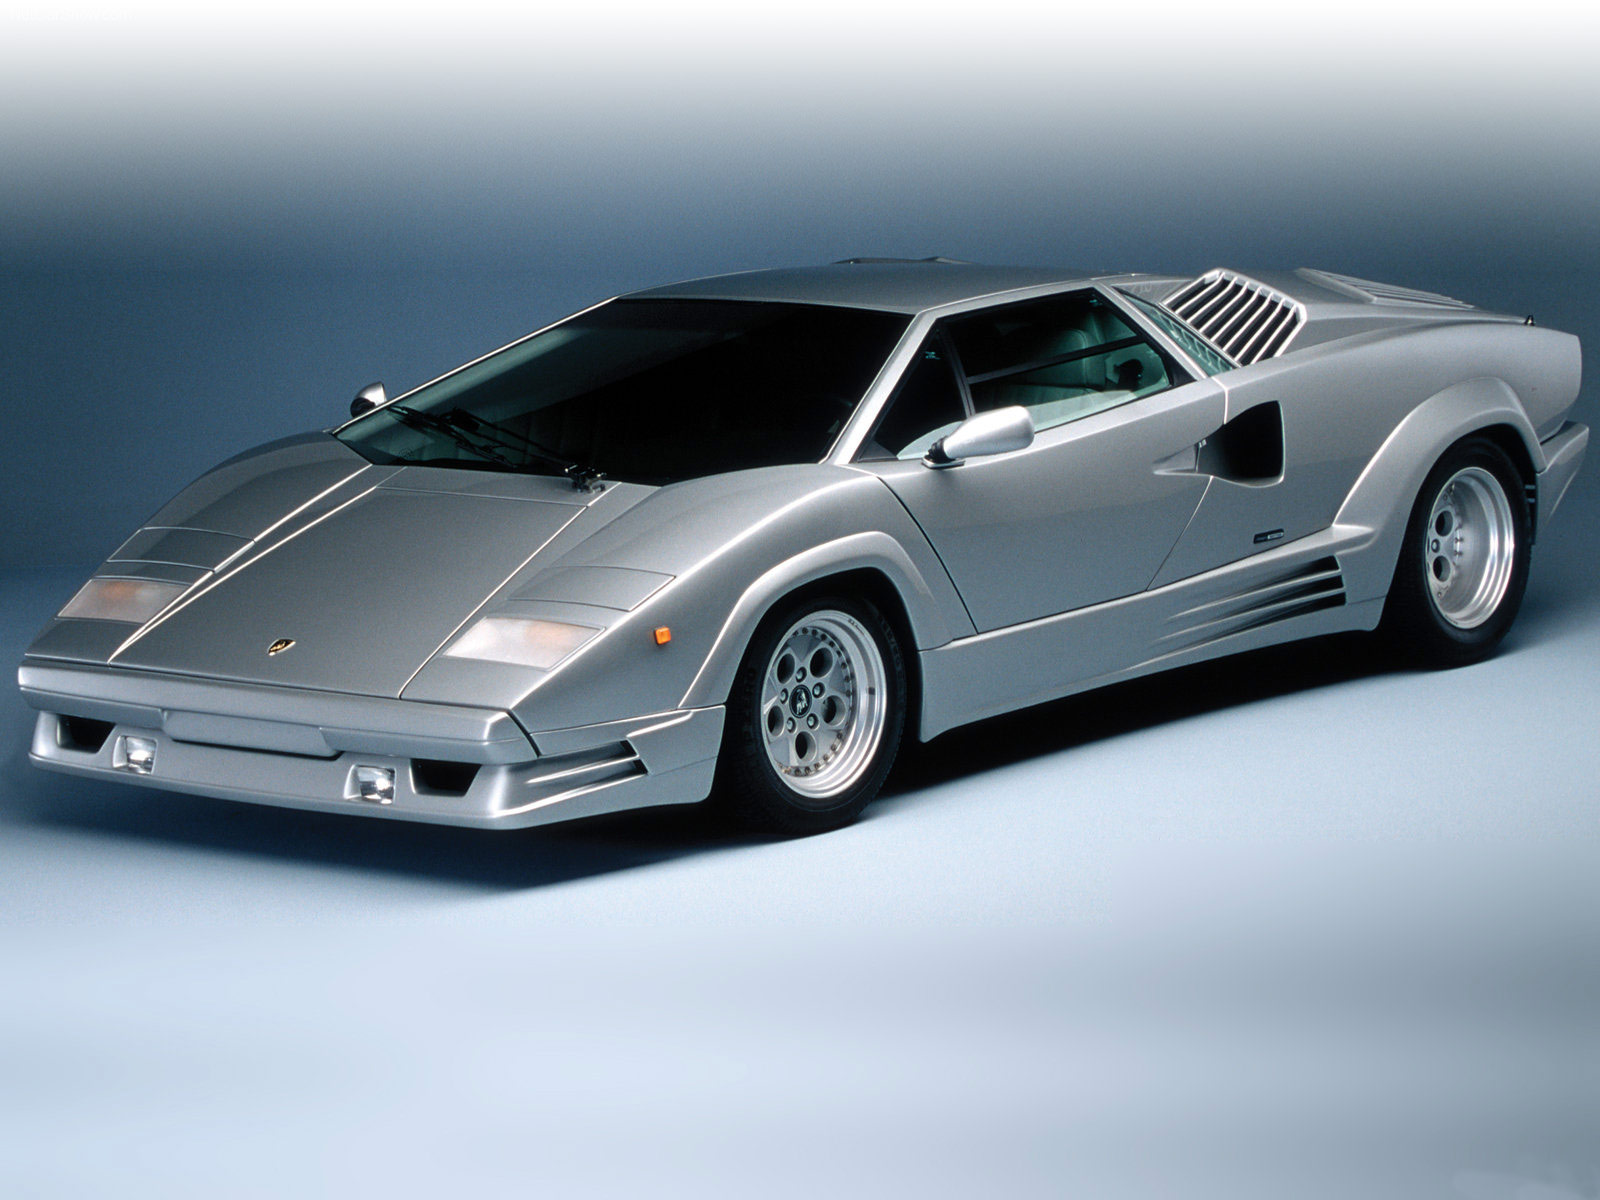 Permalink to 1989 Lamborghini Countach